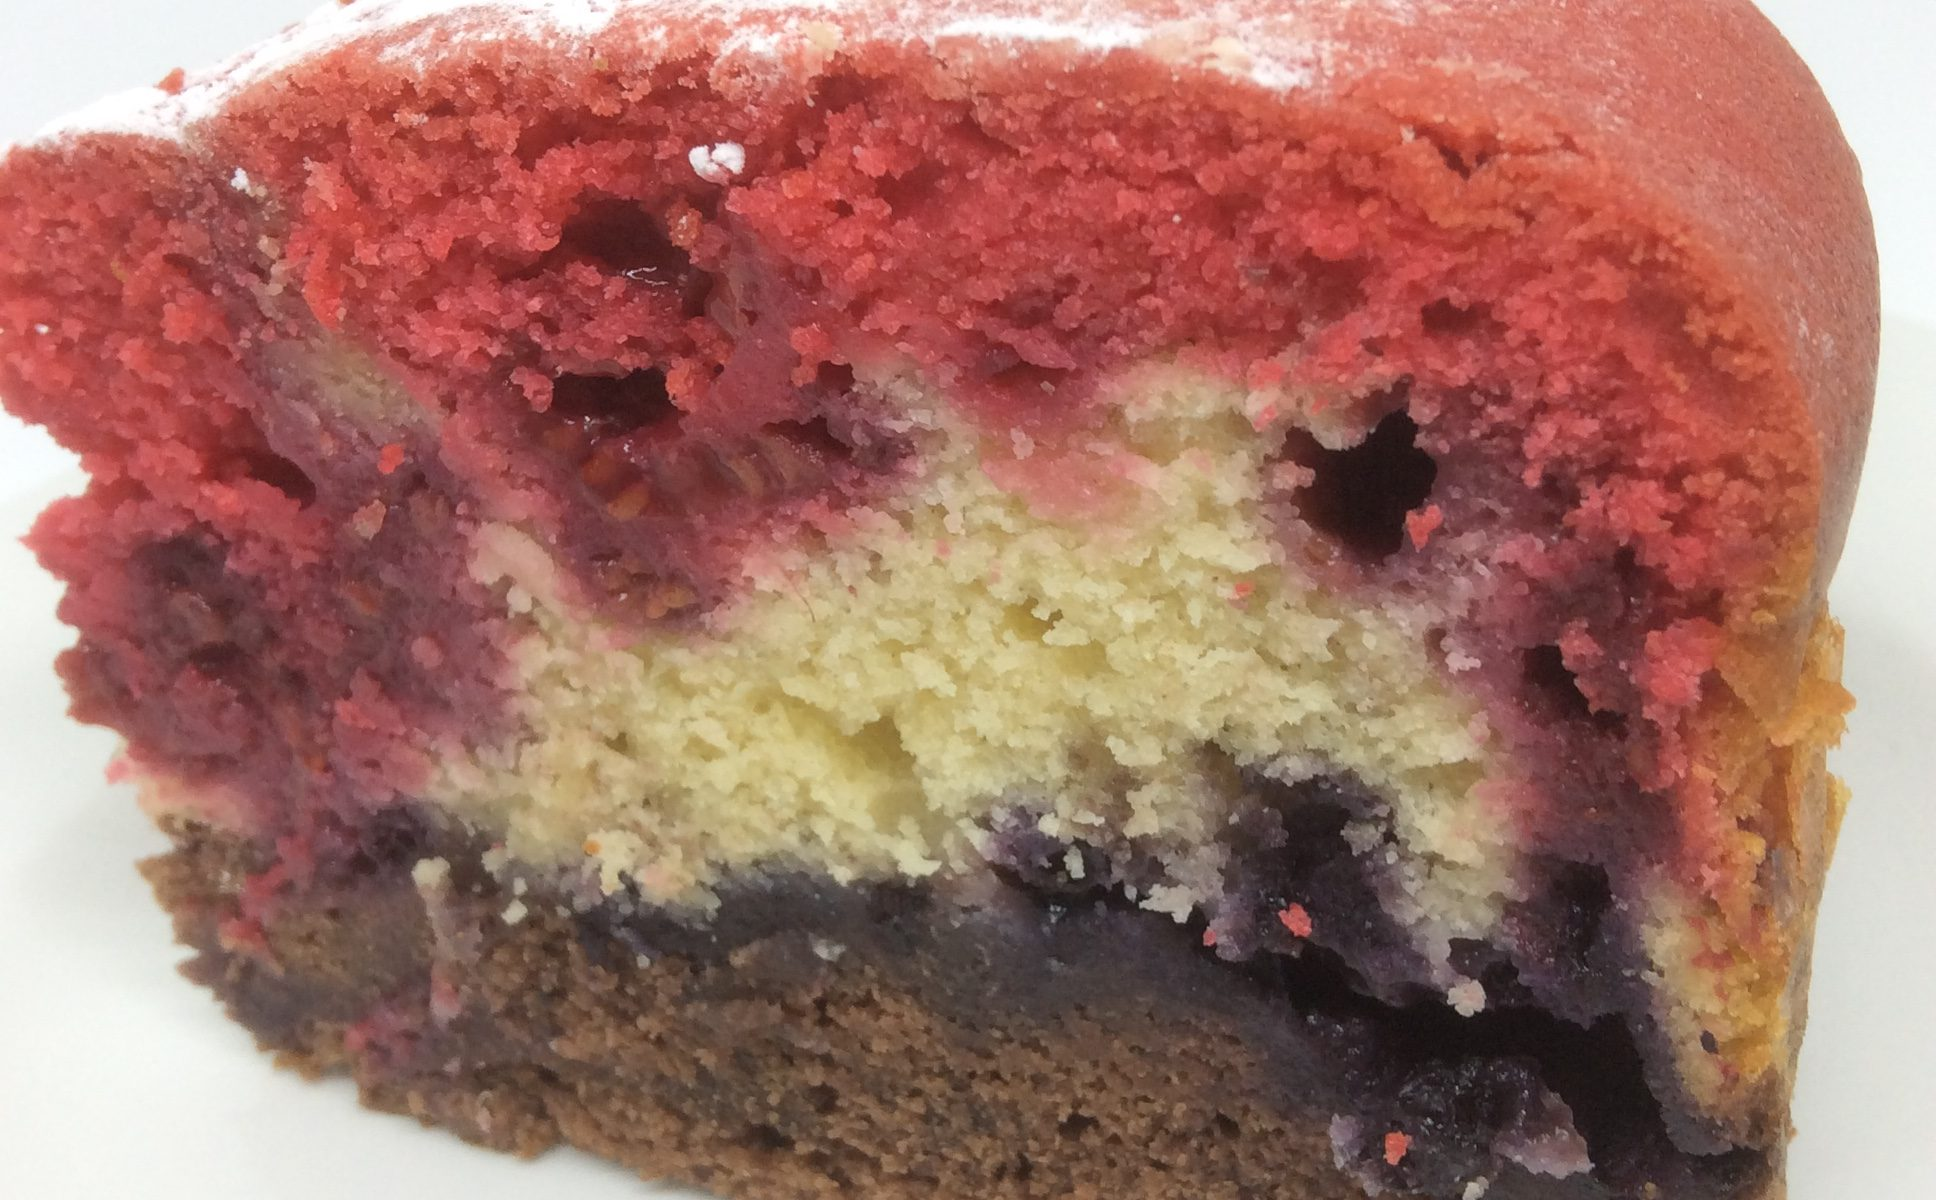 Raspberry & Blueberry Neopolitan Cake